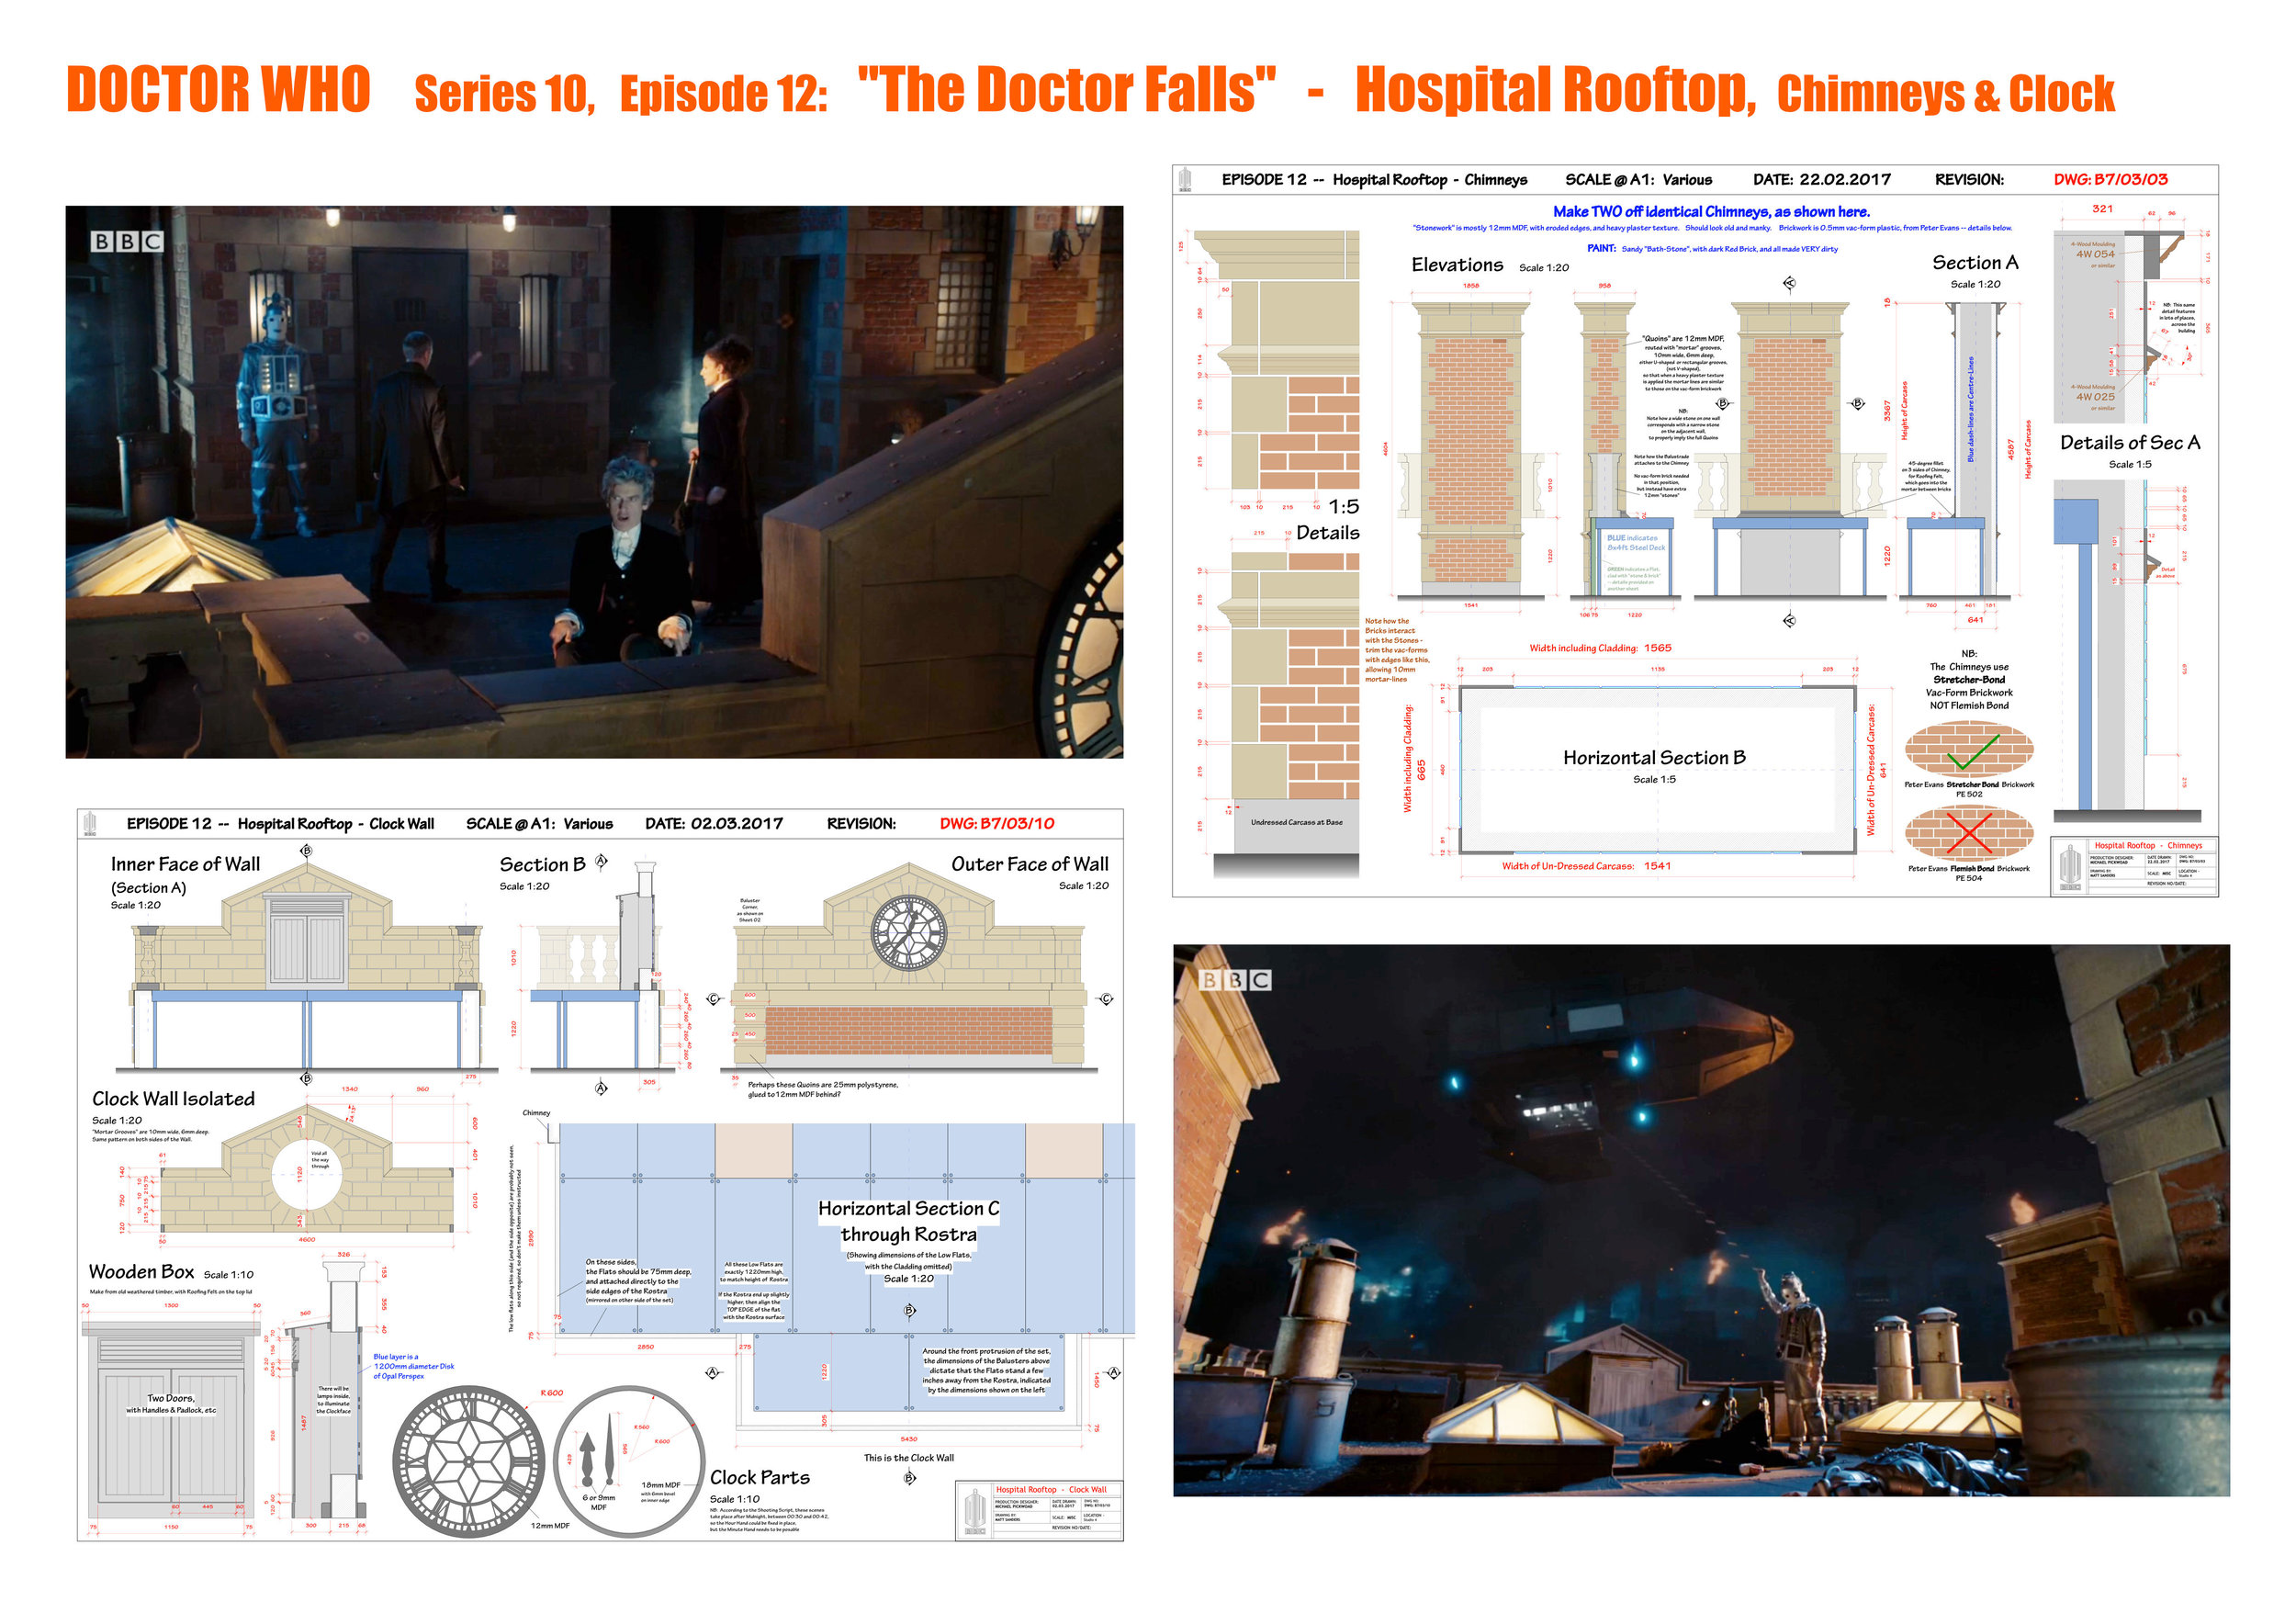 Ep 12 - The Doctor Falls - Hospital Chimneys.jpg